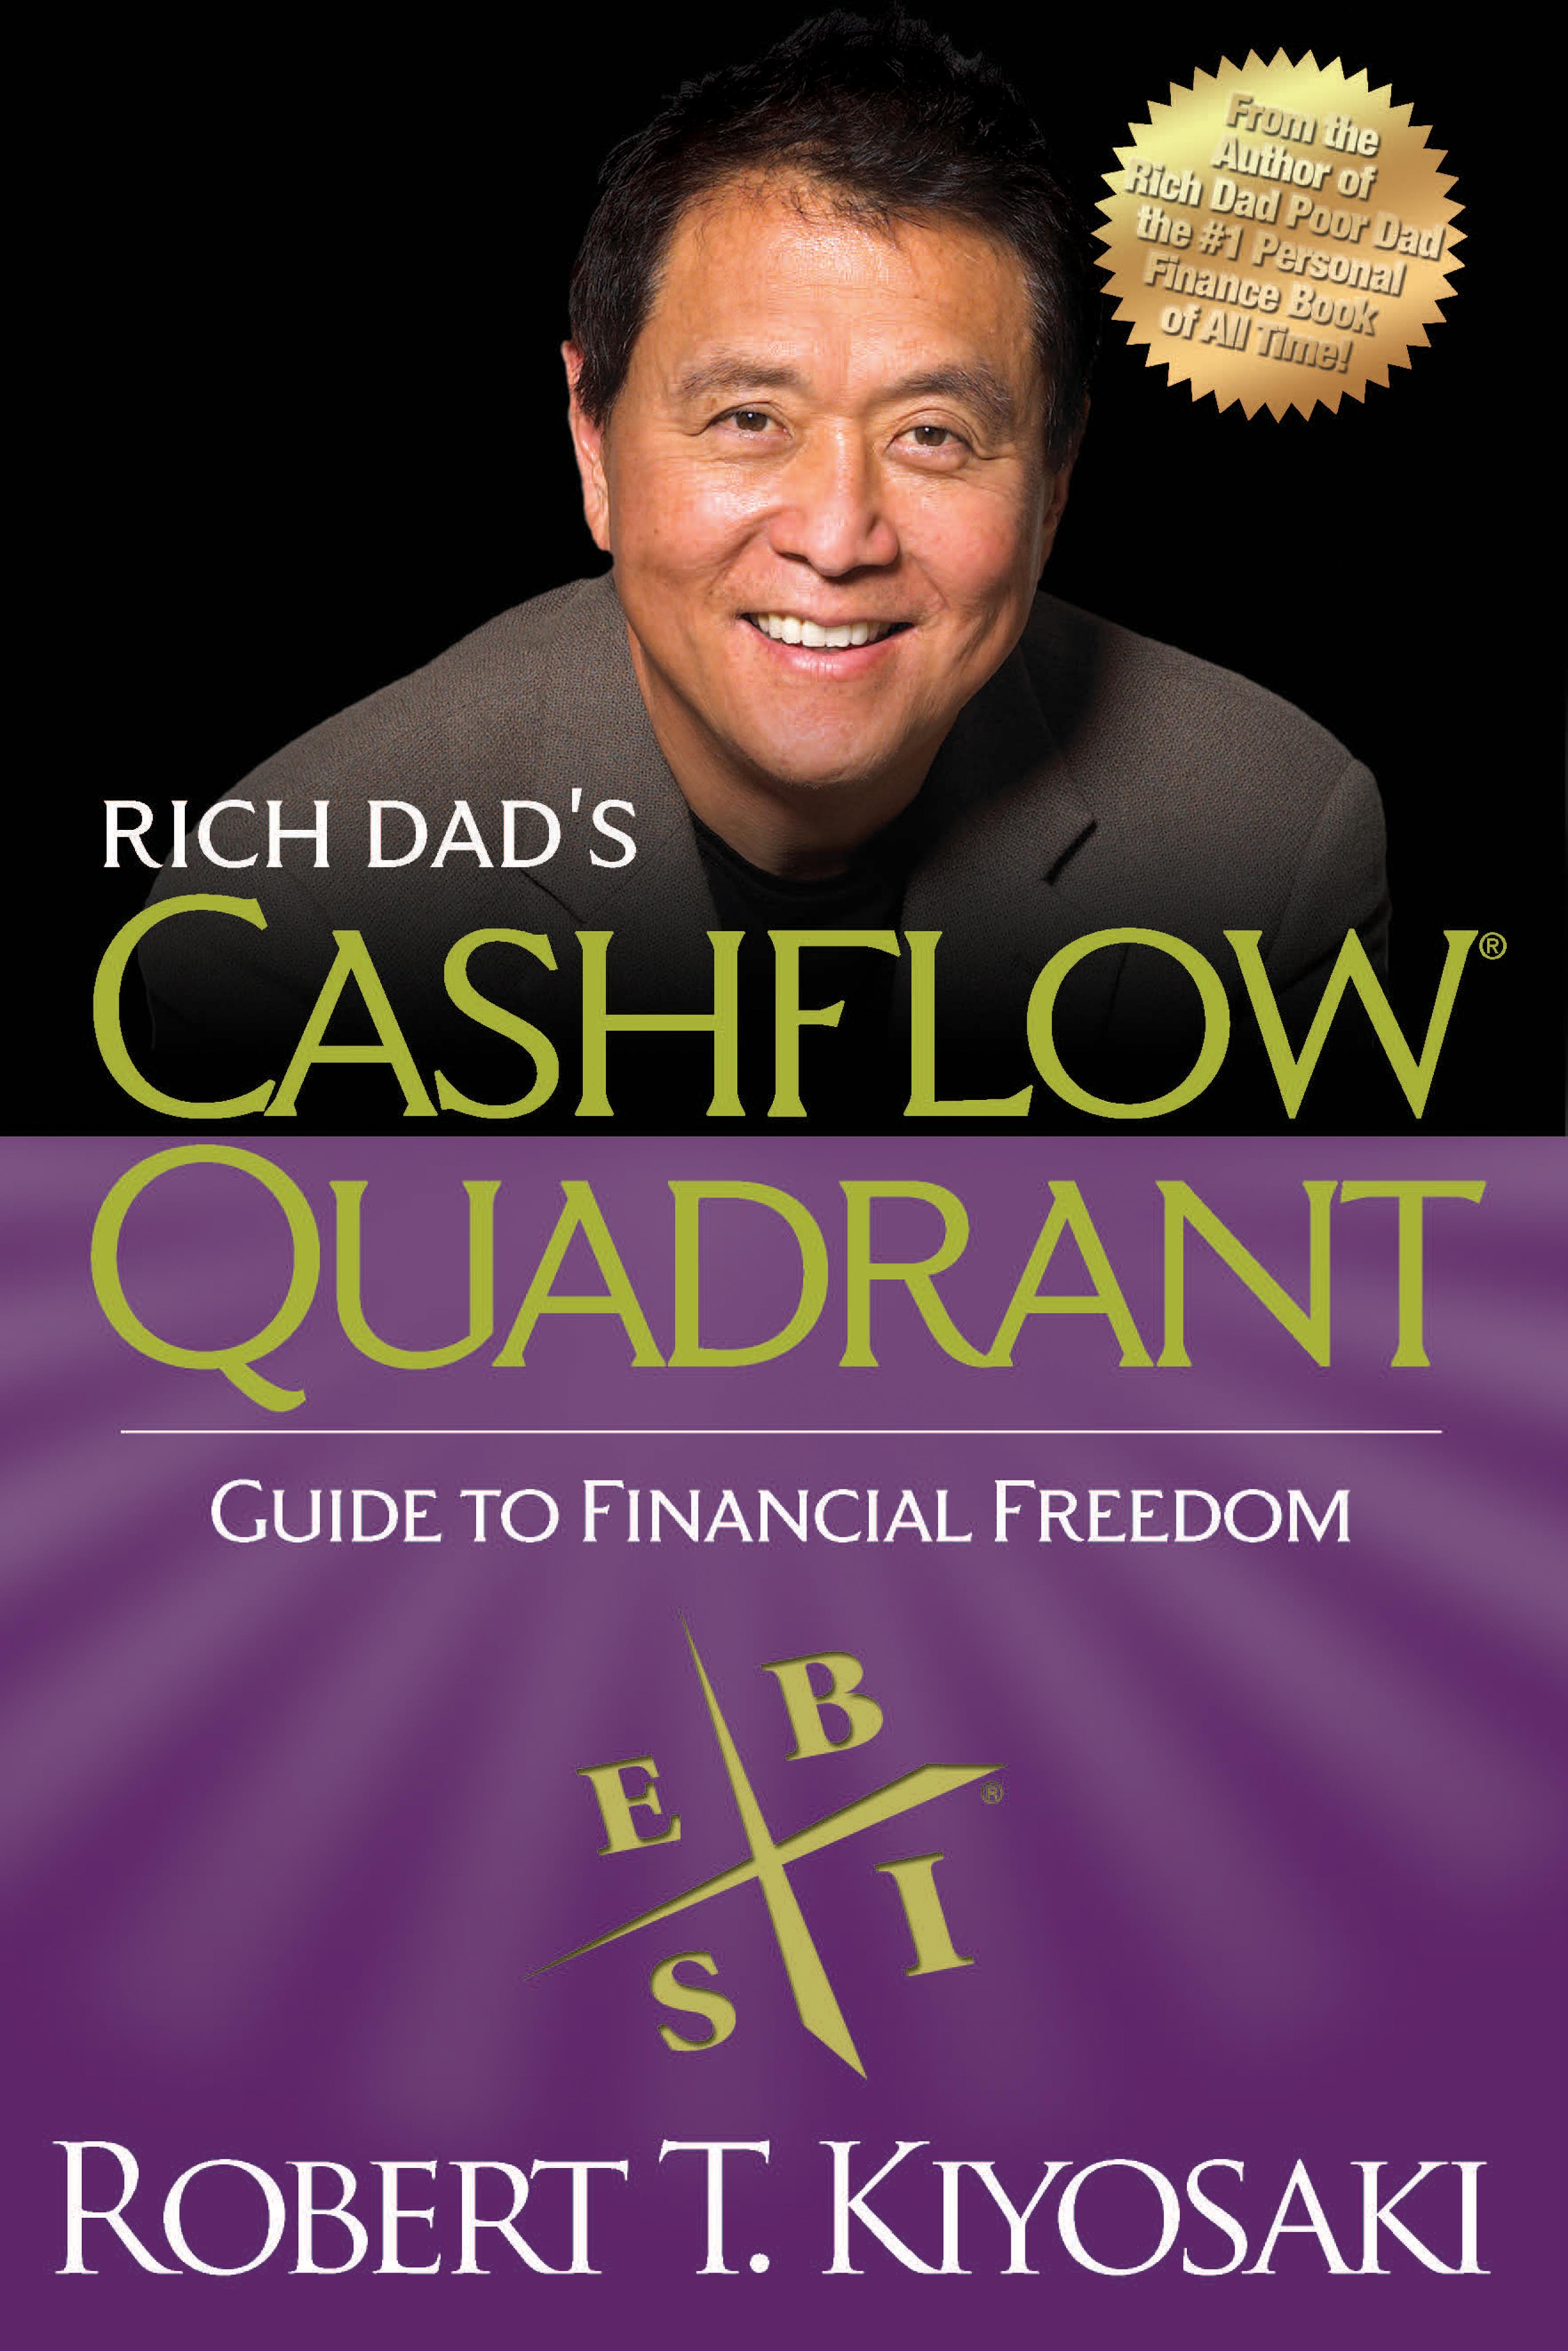 Download Ebook Rich Dad's CASHFLOW Quadrant by Robert T. Kiyosaki Pdf